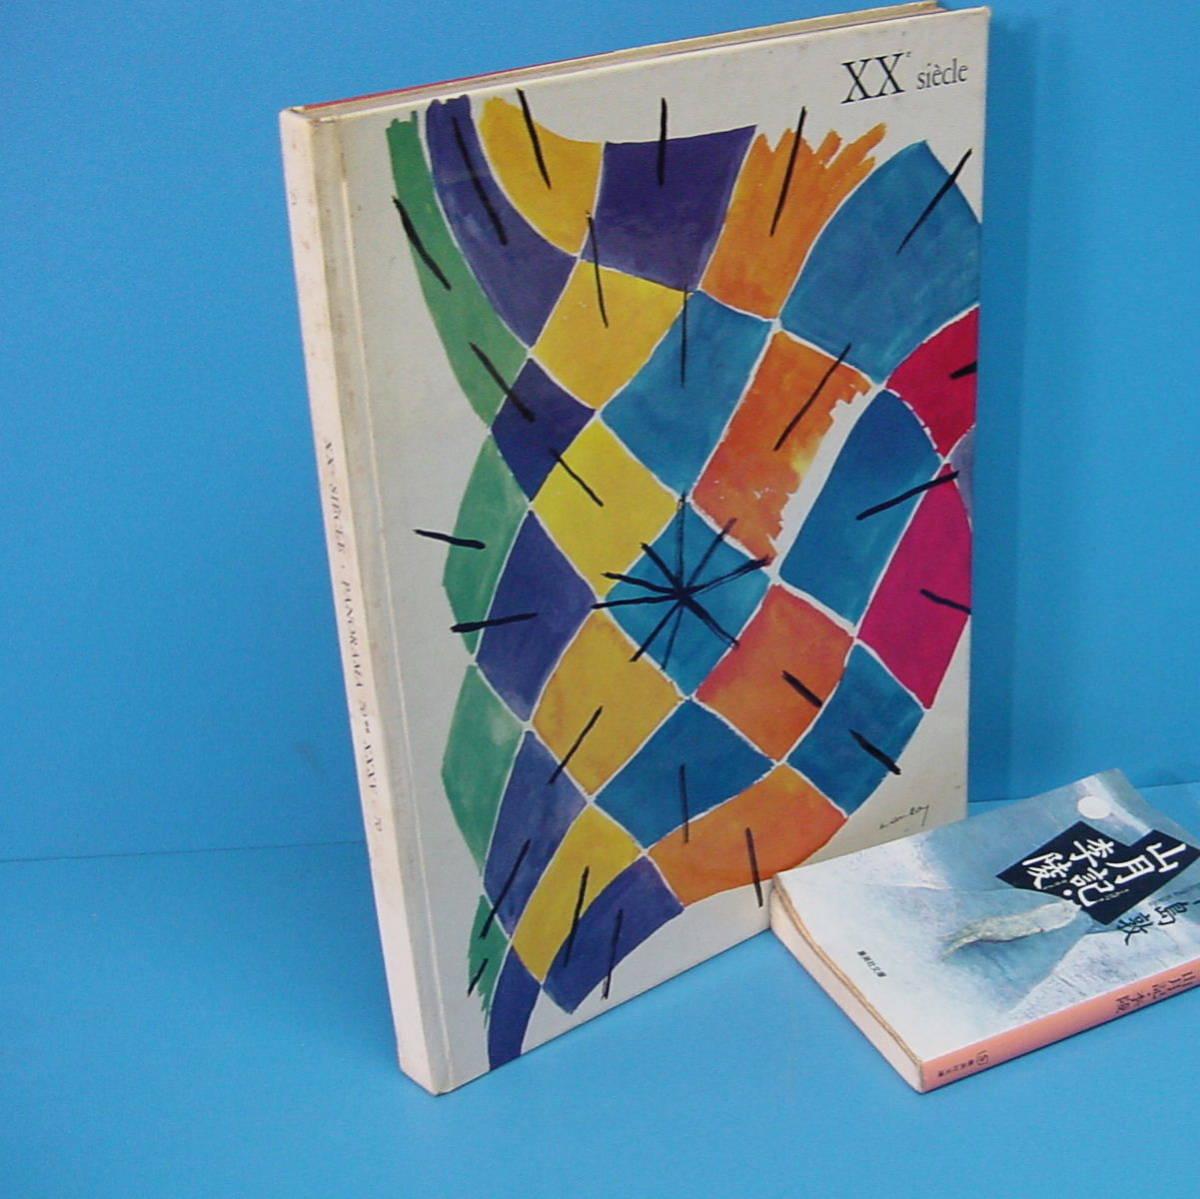 F「XXe Siecle 35 1970 マリーニ,バーグマンのオリジナルリトグラフ入」人気の20世紀誌!     検 Marino Marini D'Anna-Eva Bergmann